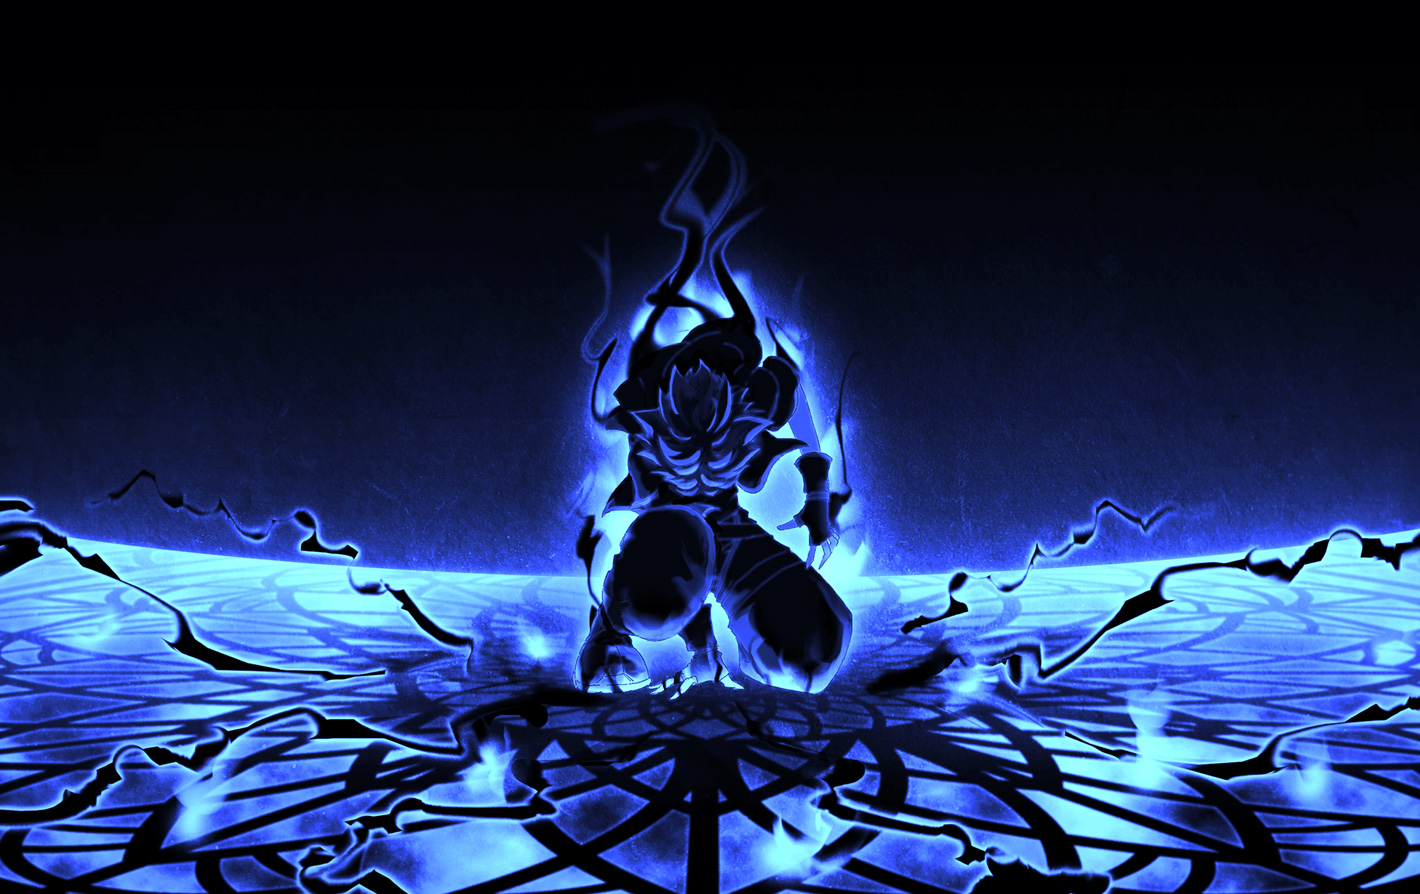 Kingdom Hearts Wallpapers , HD Wallpaper & Backgrounds